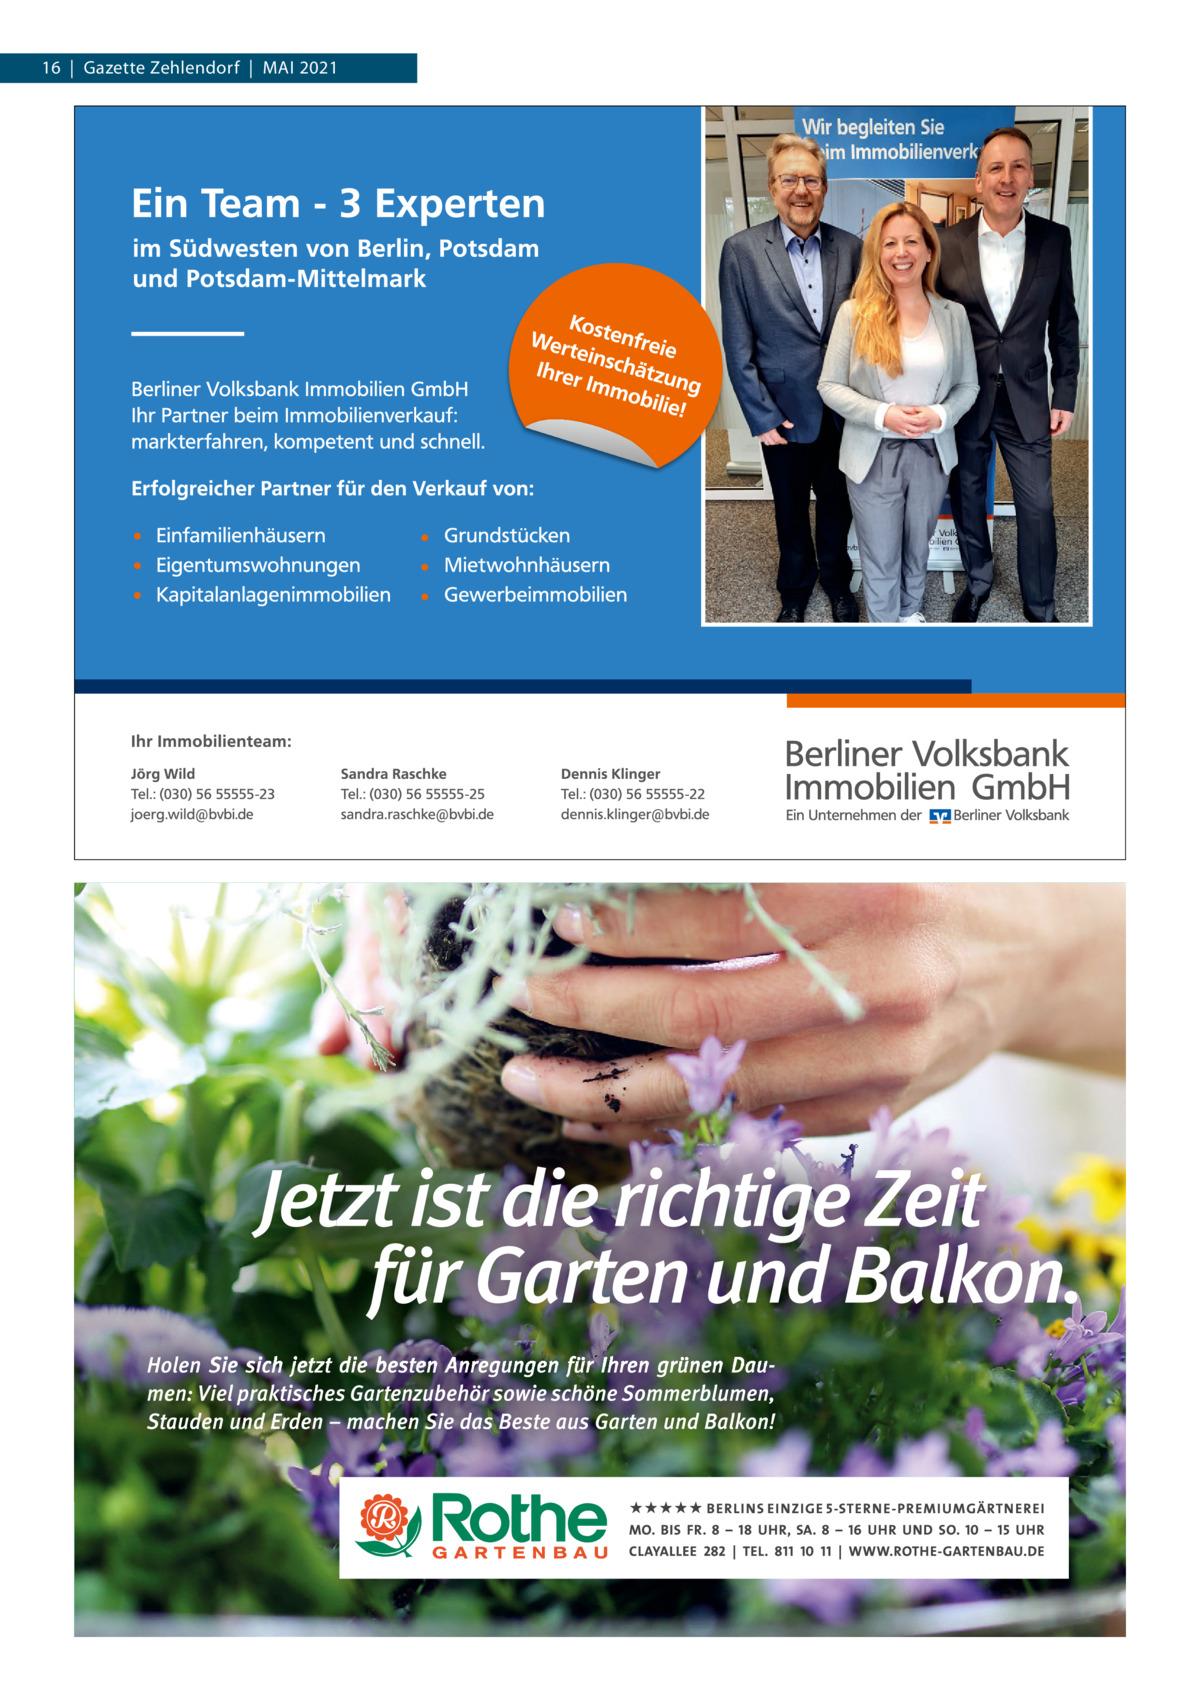 16 Gazette Zehlendorf MAI 2021